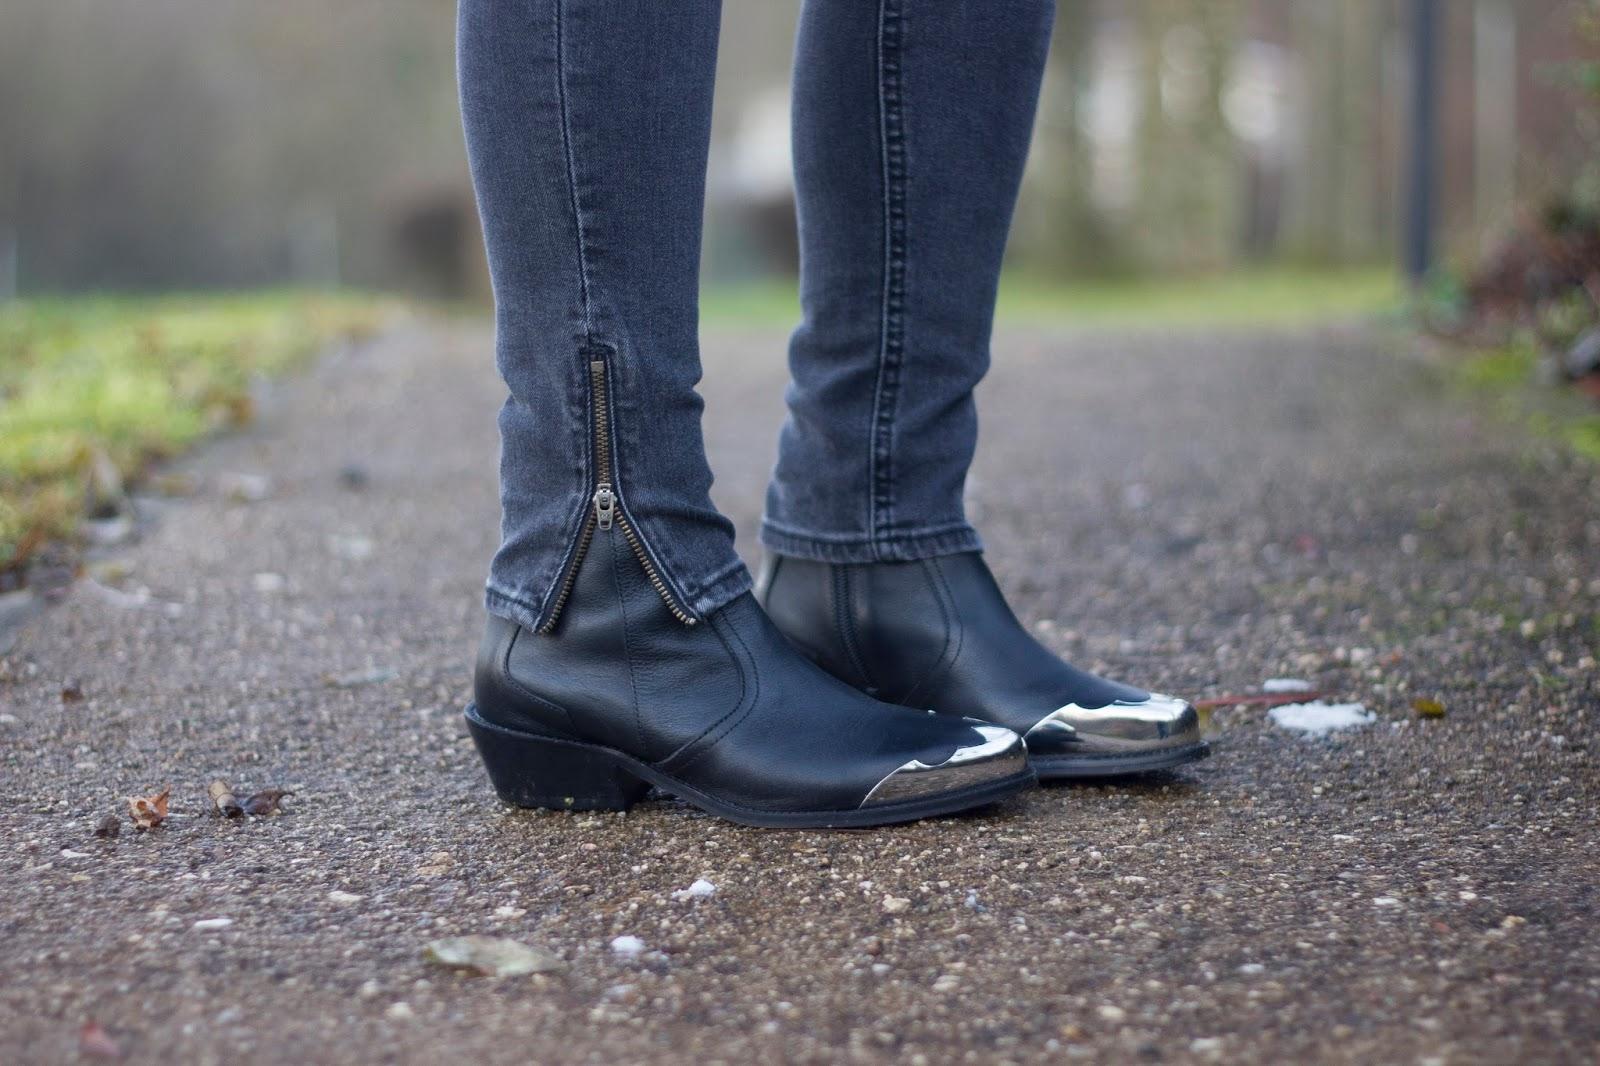 boots-santiags-asos-rock-accessoires-mode 3303ef3aa62